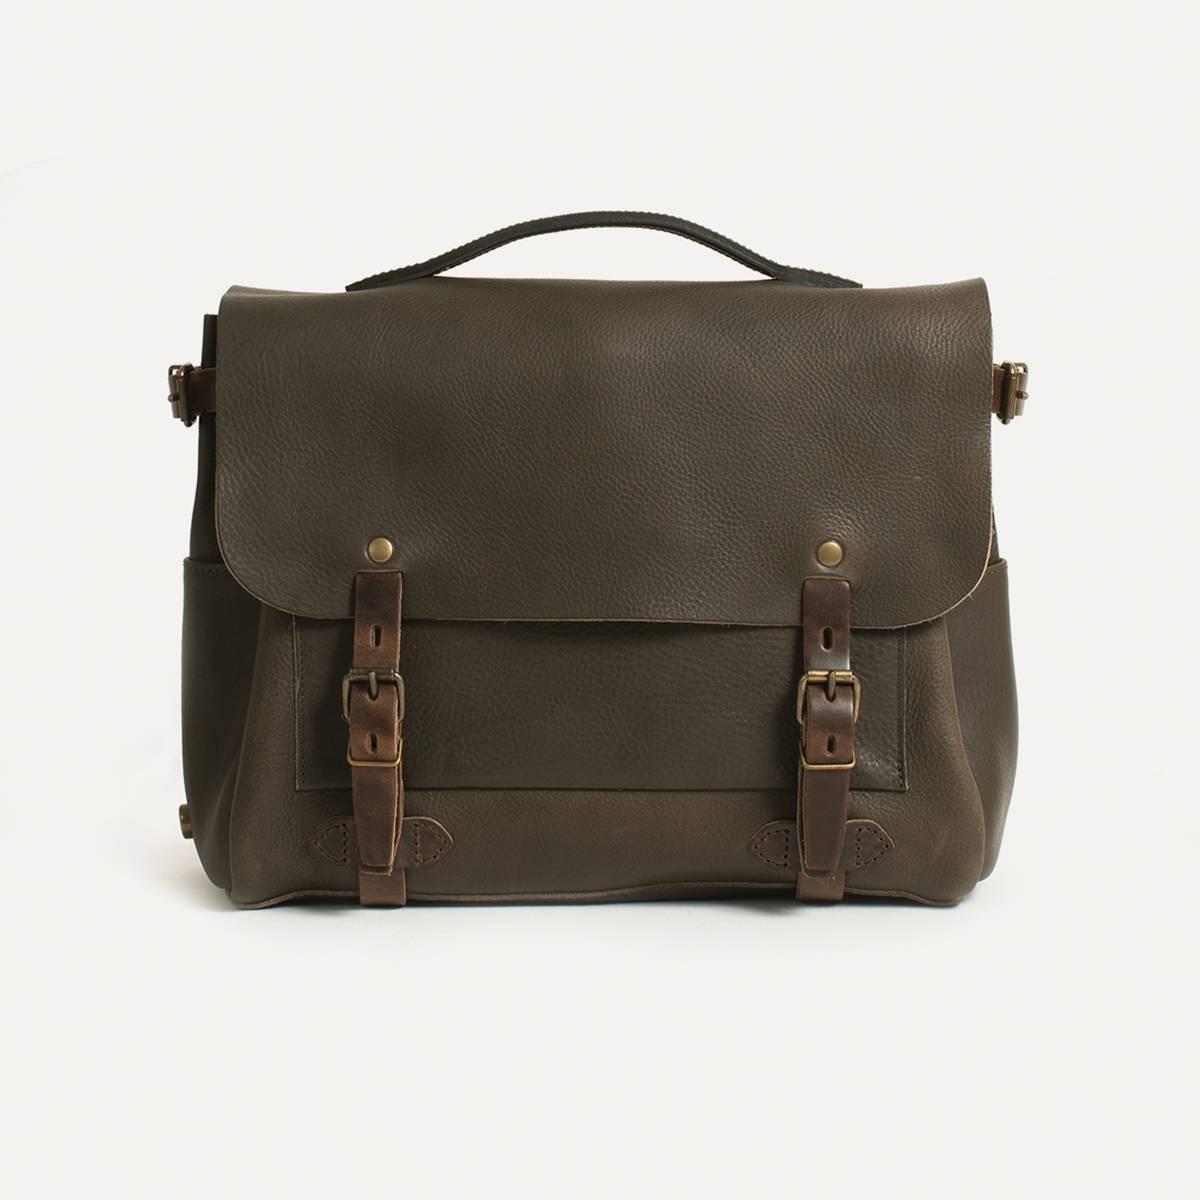 Postman bag Eclair M - Smog (image n°1)